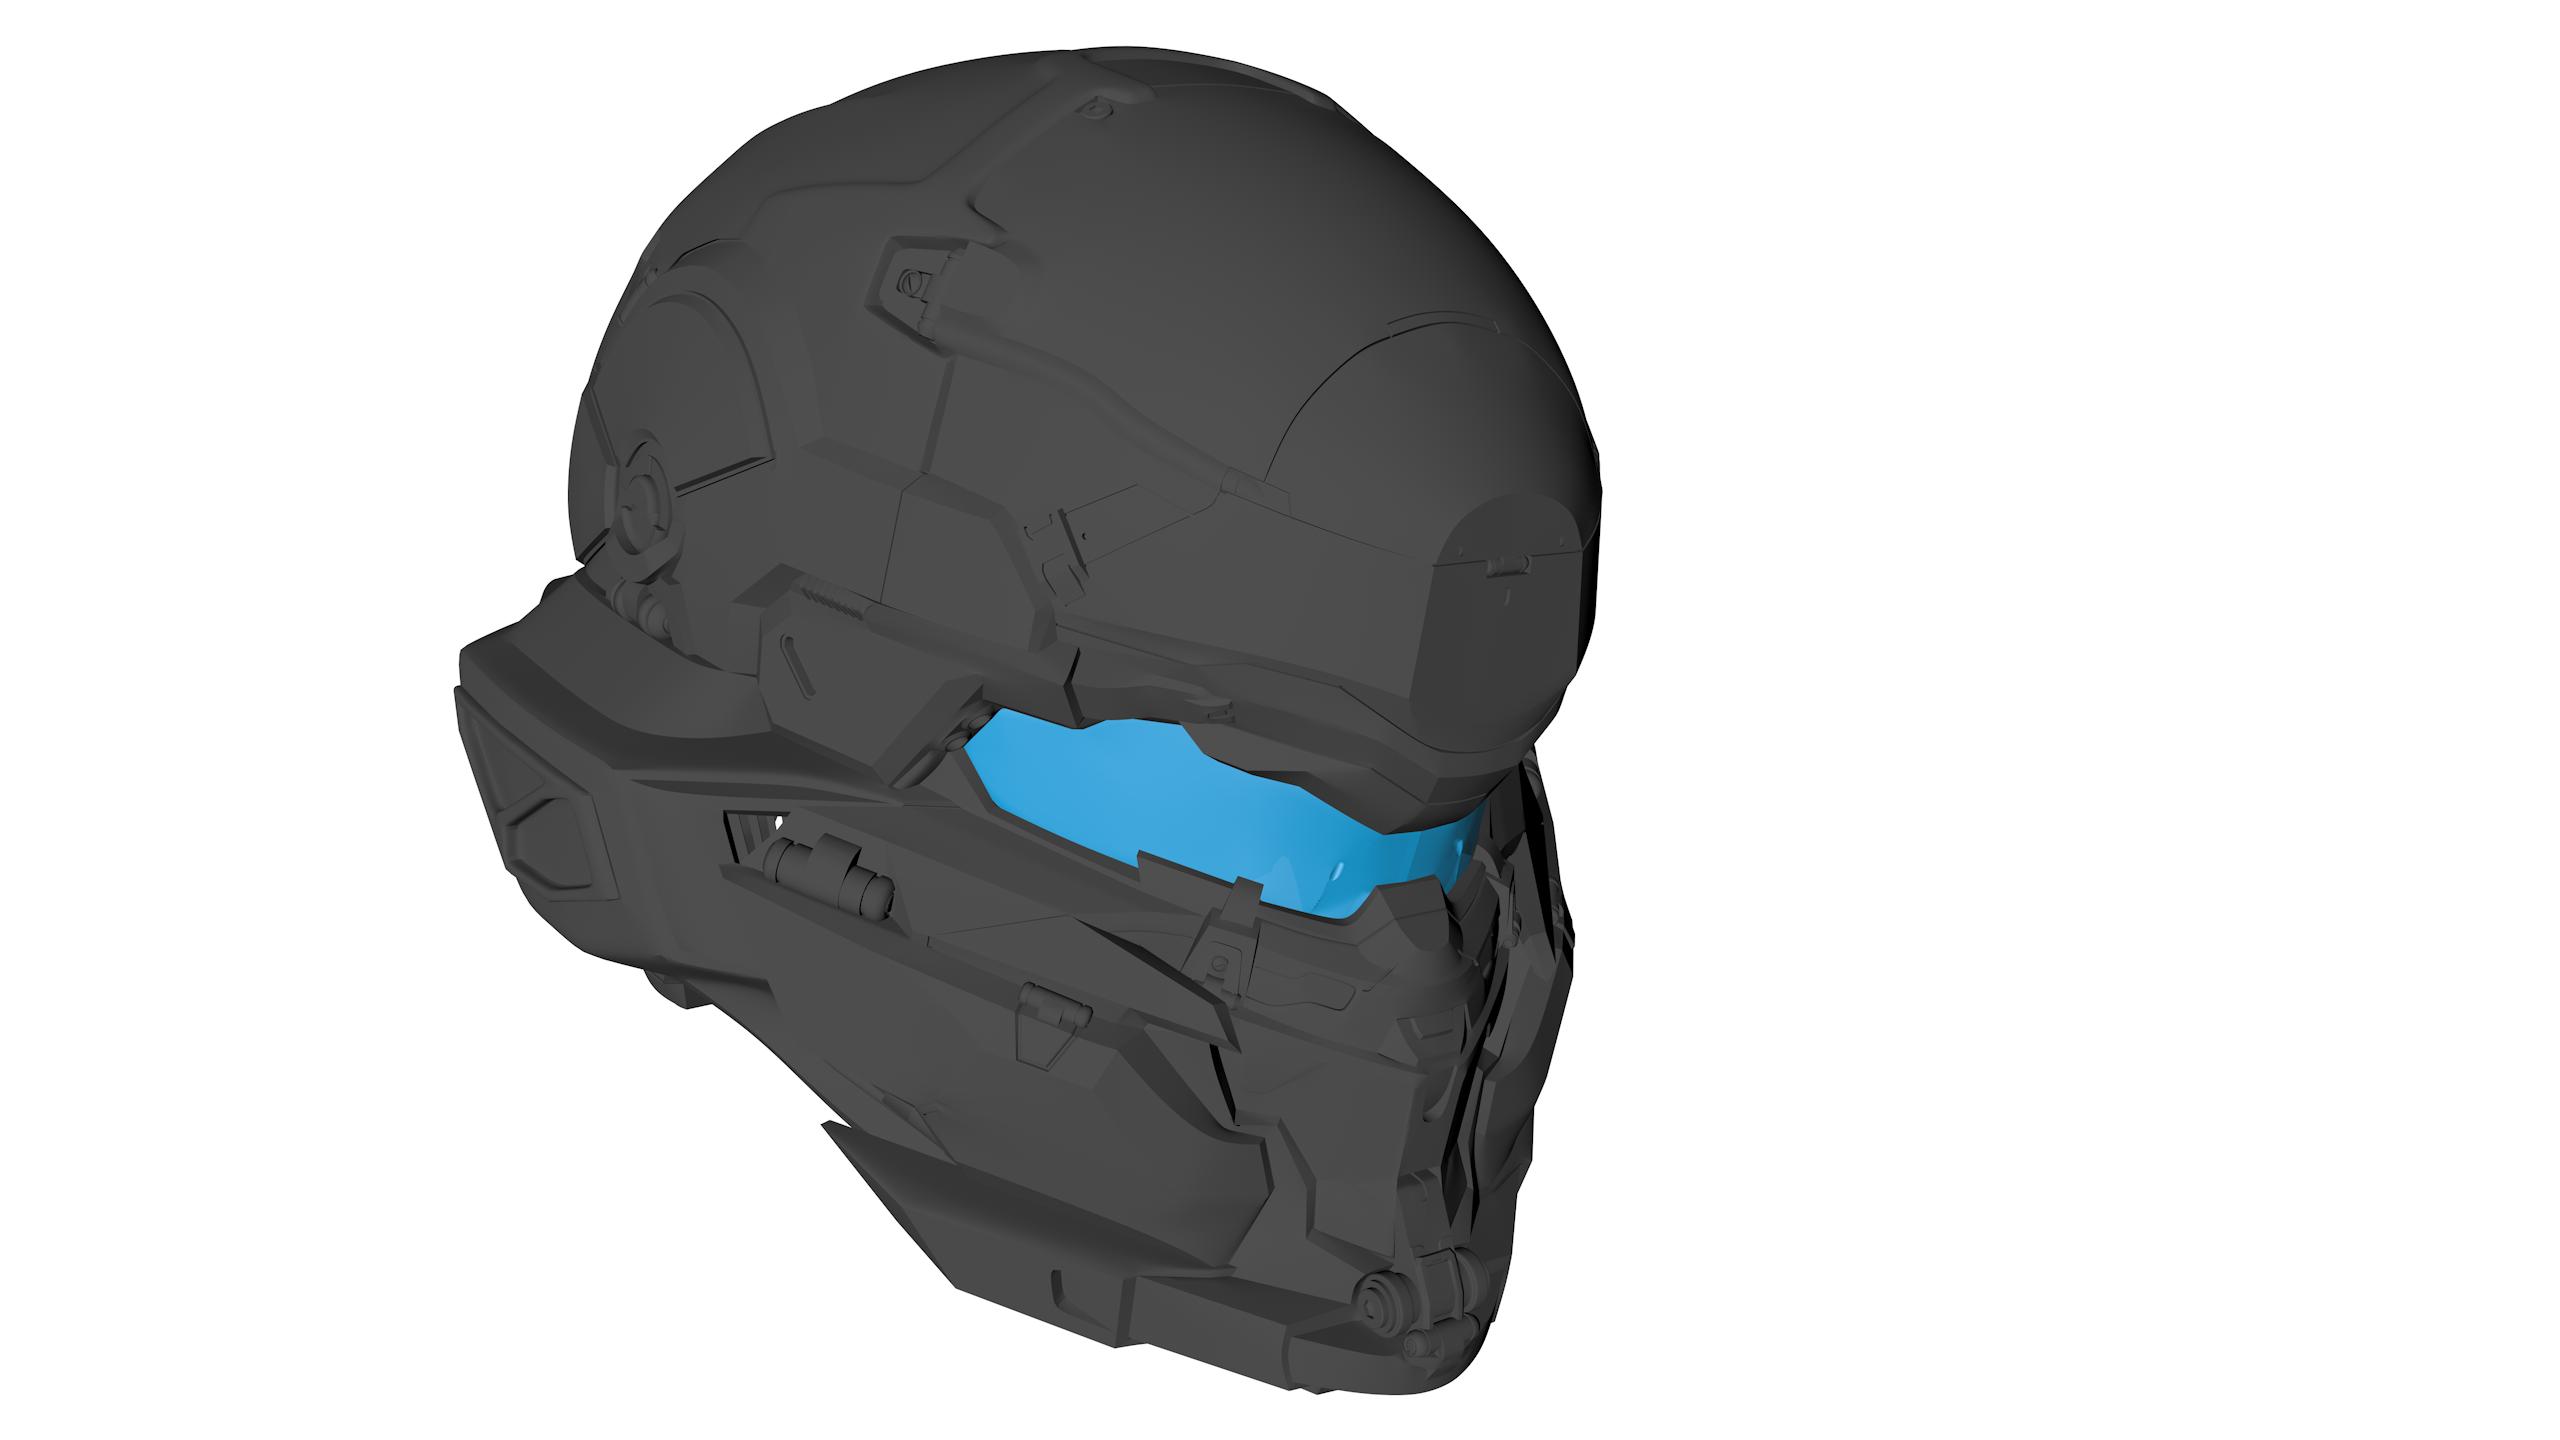 Halo Cqb Helmet 3d Print